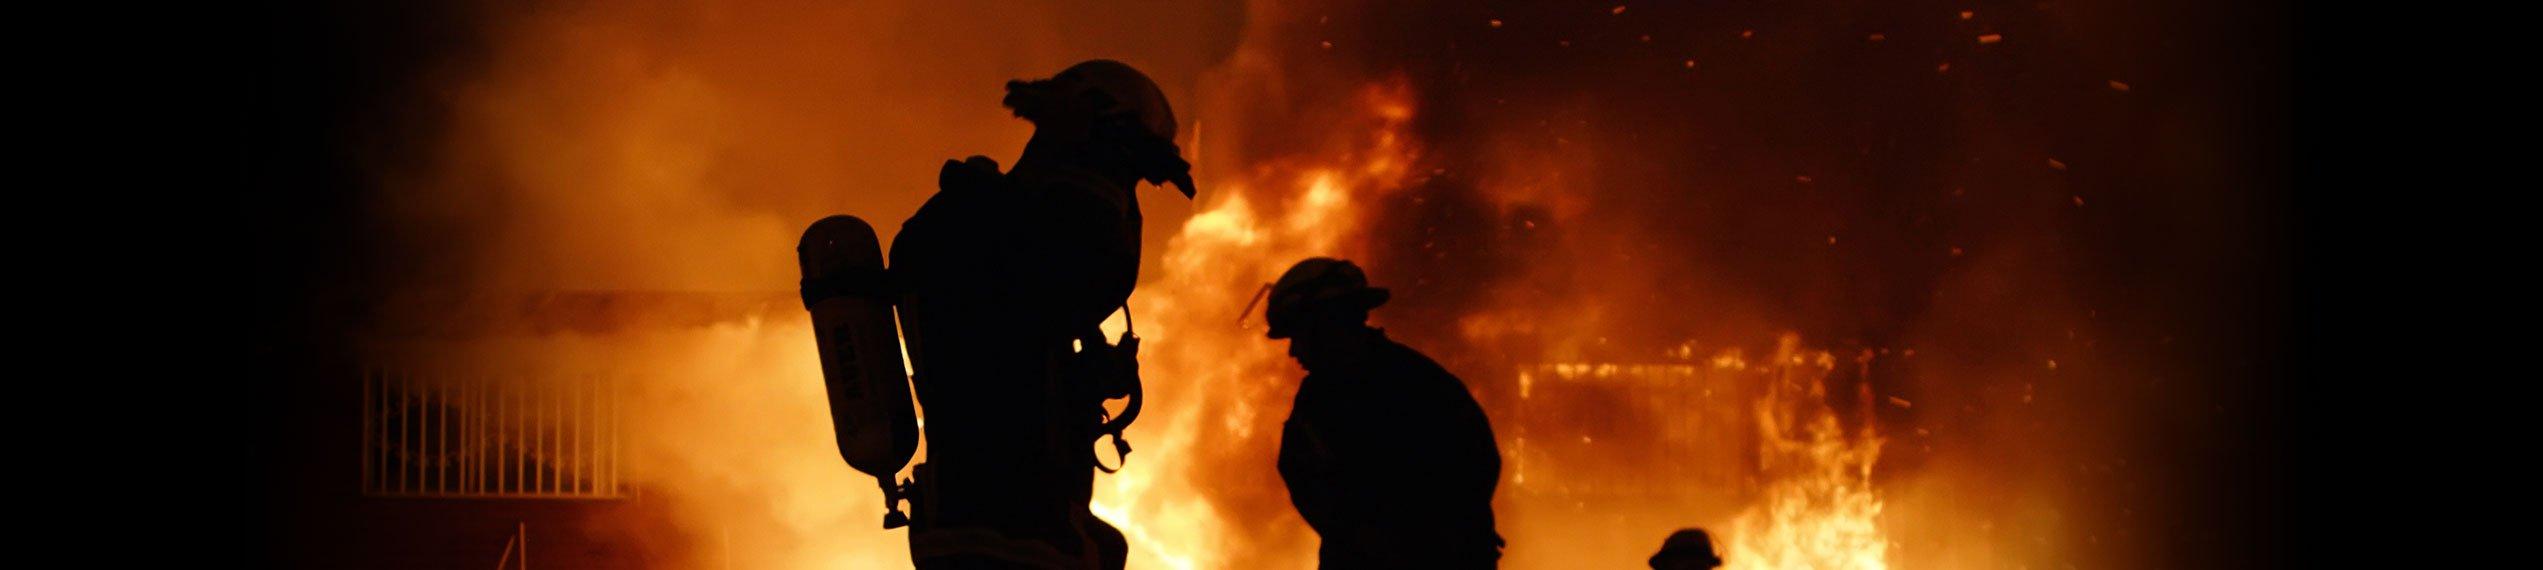 Fire & Smoke Damage Removal in Paul Davis Emergency Services of Terre Haute, IN